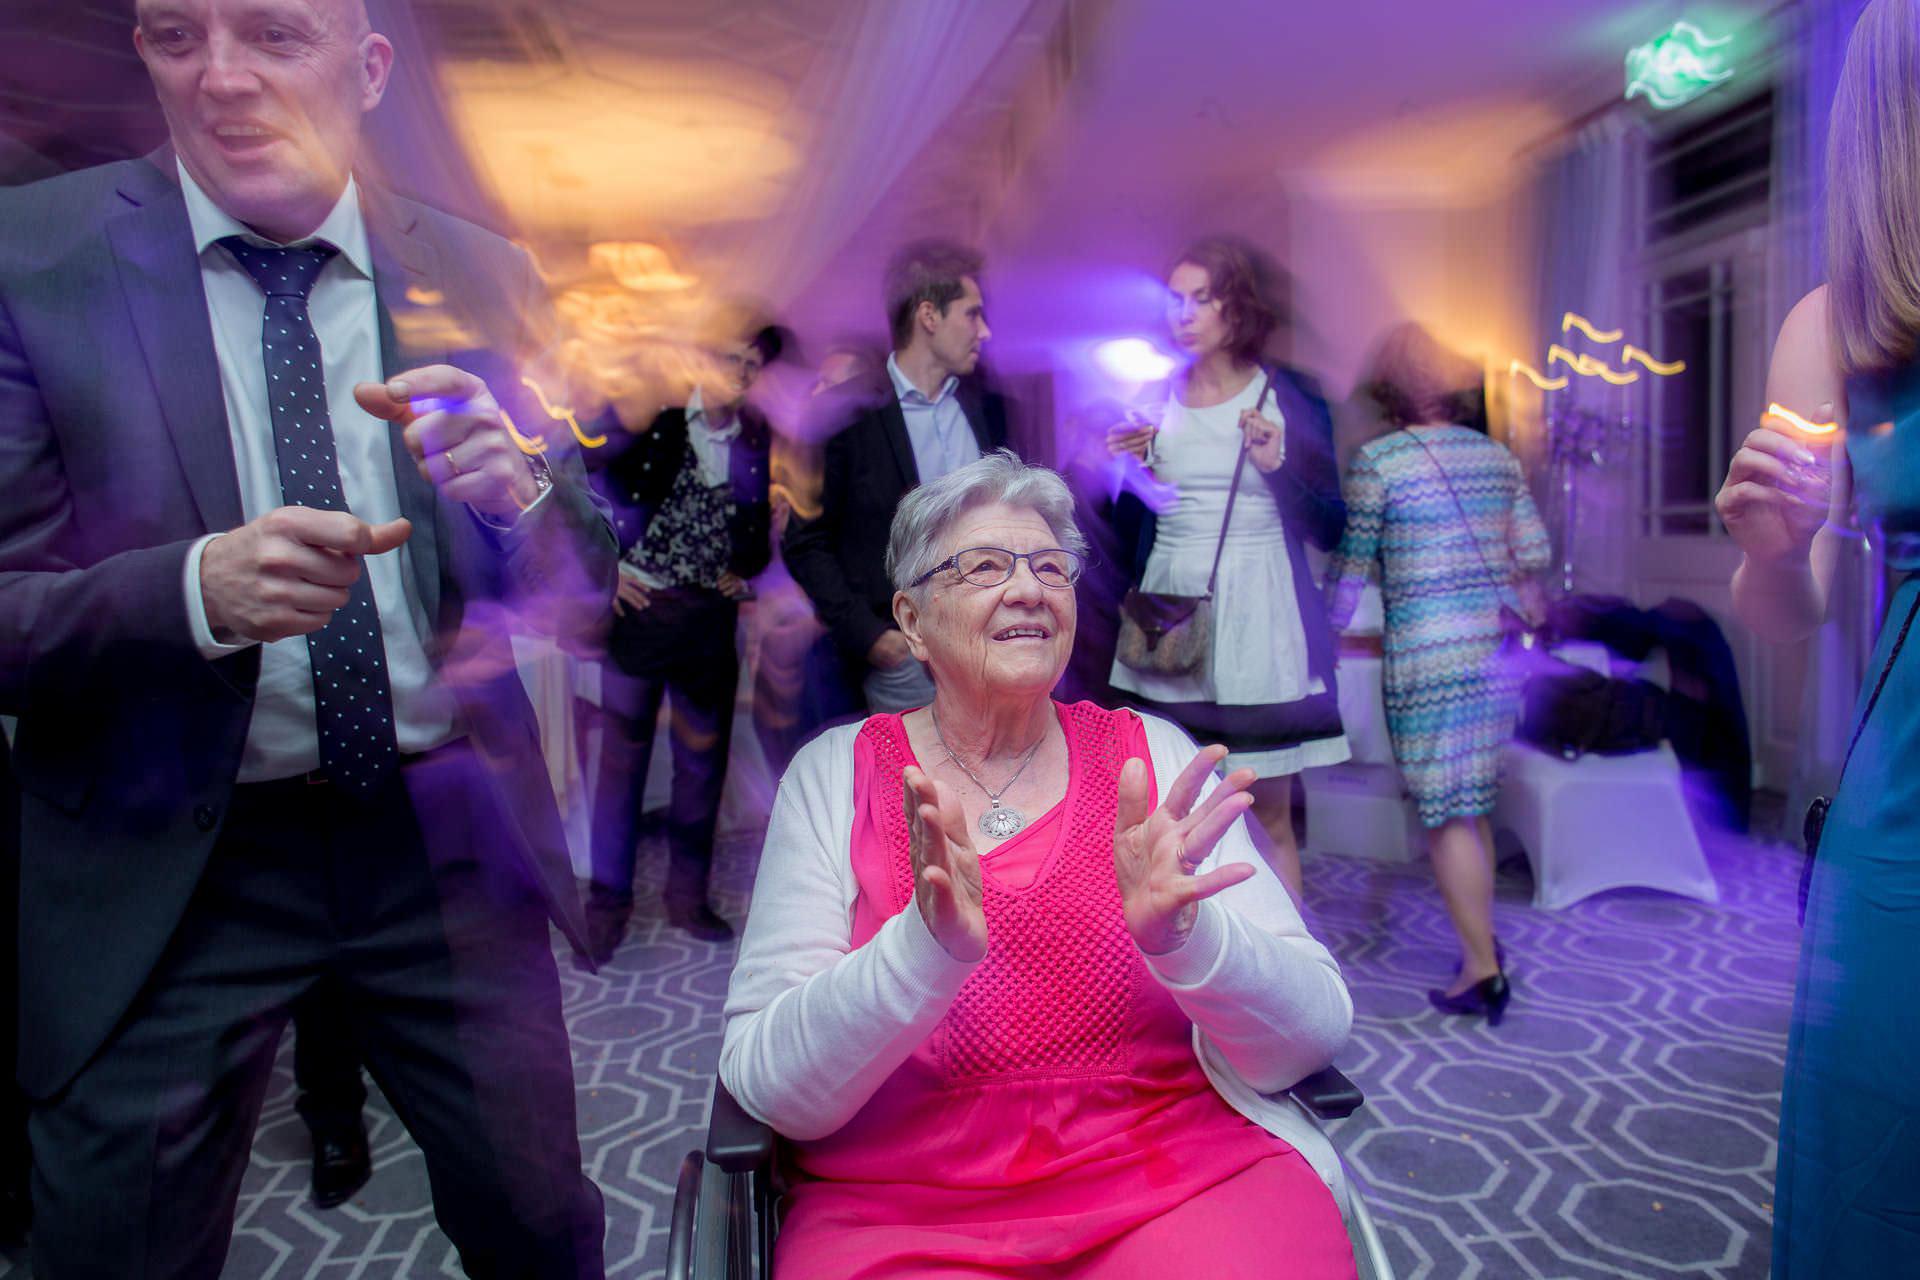 Wotton House wedding grandmother dancing